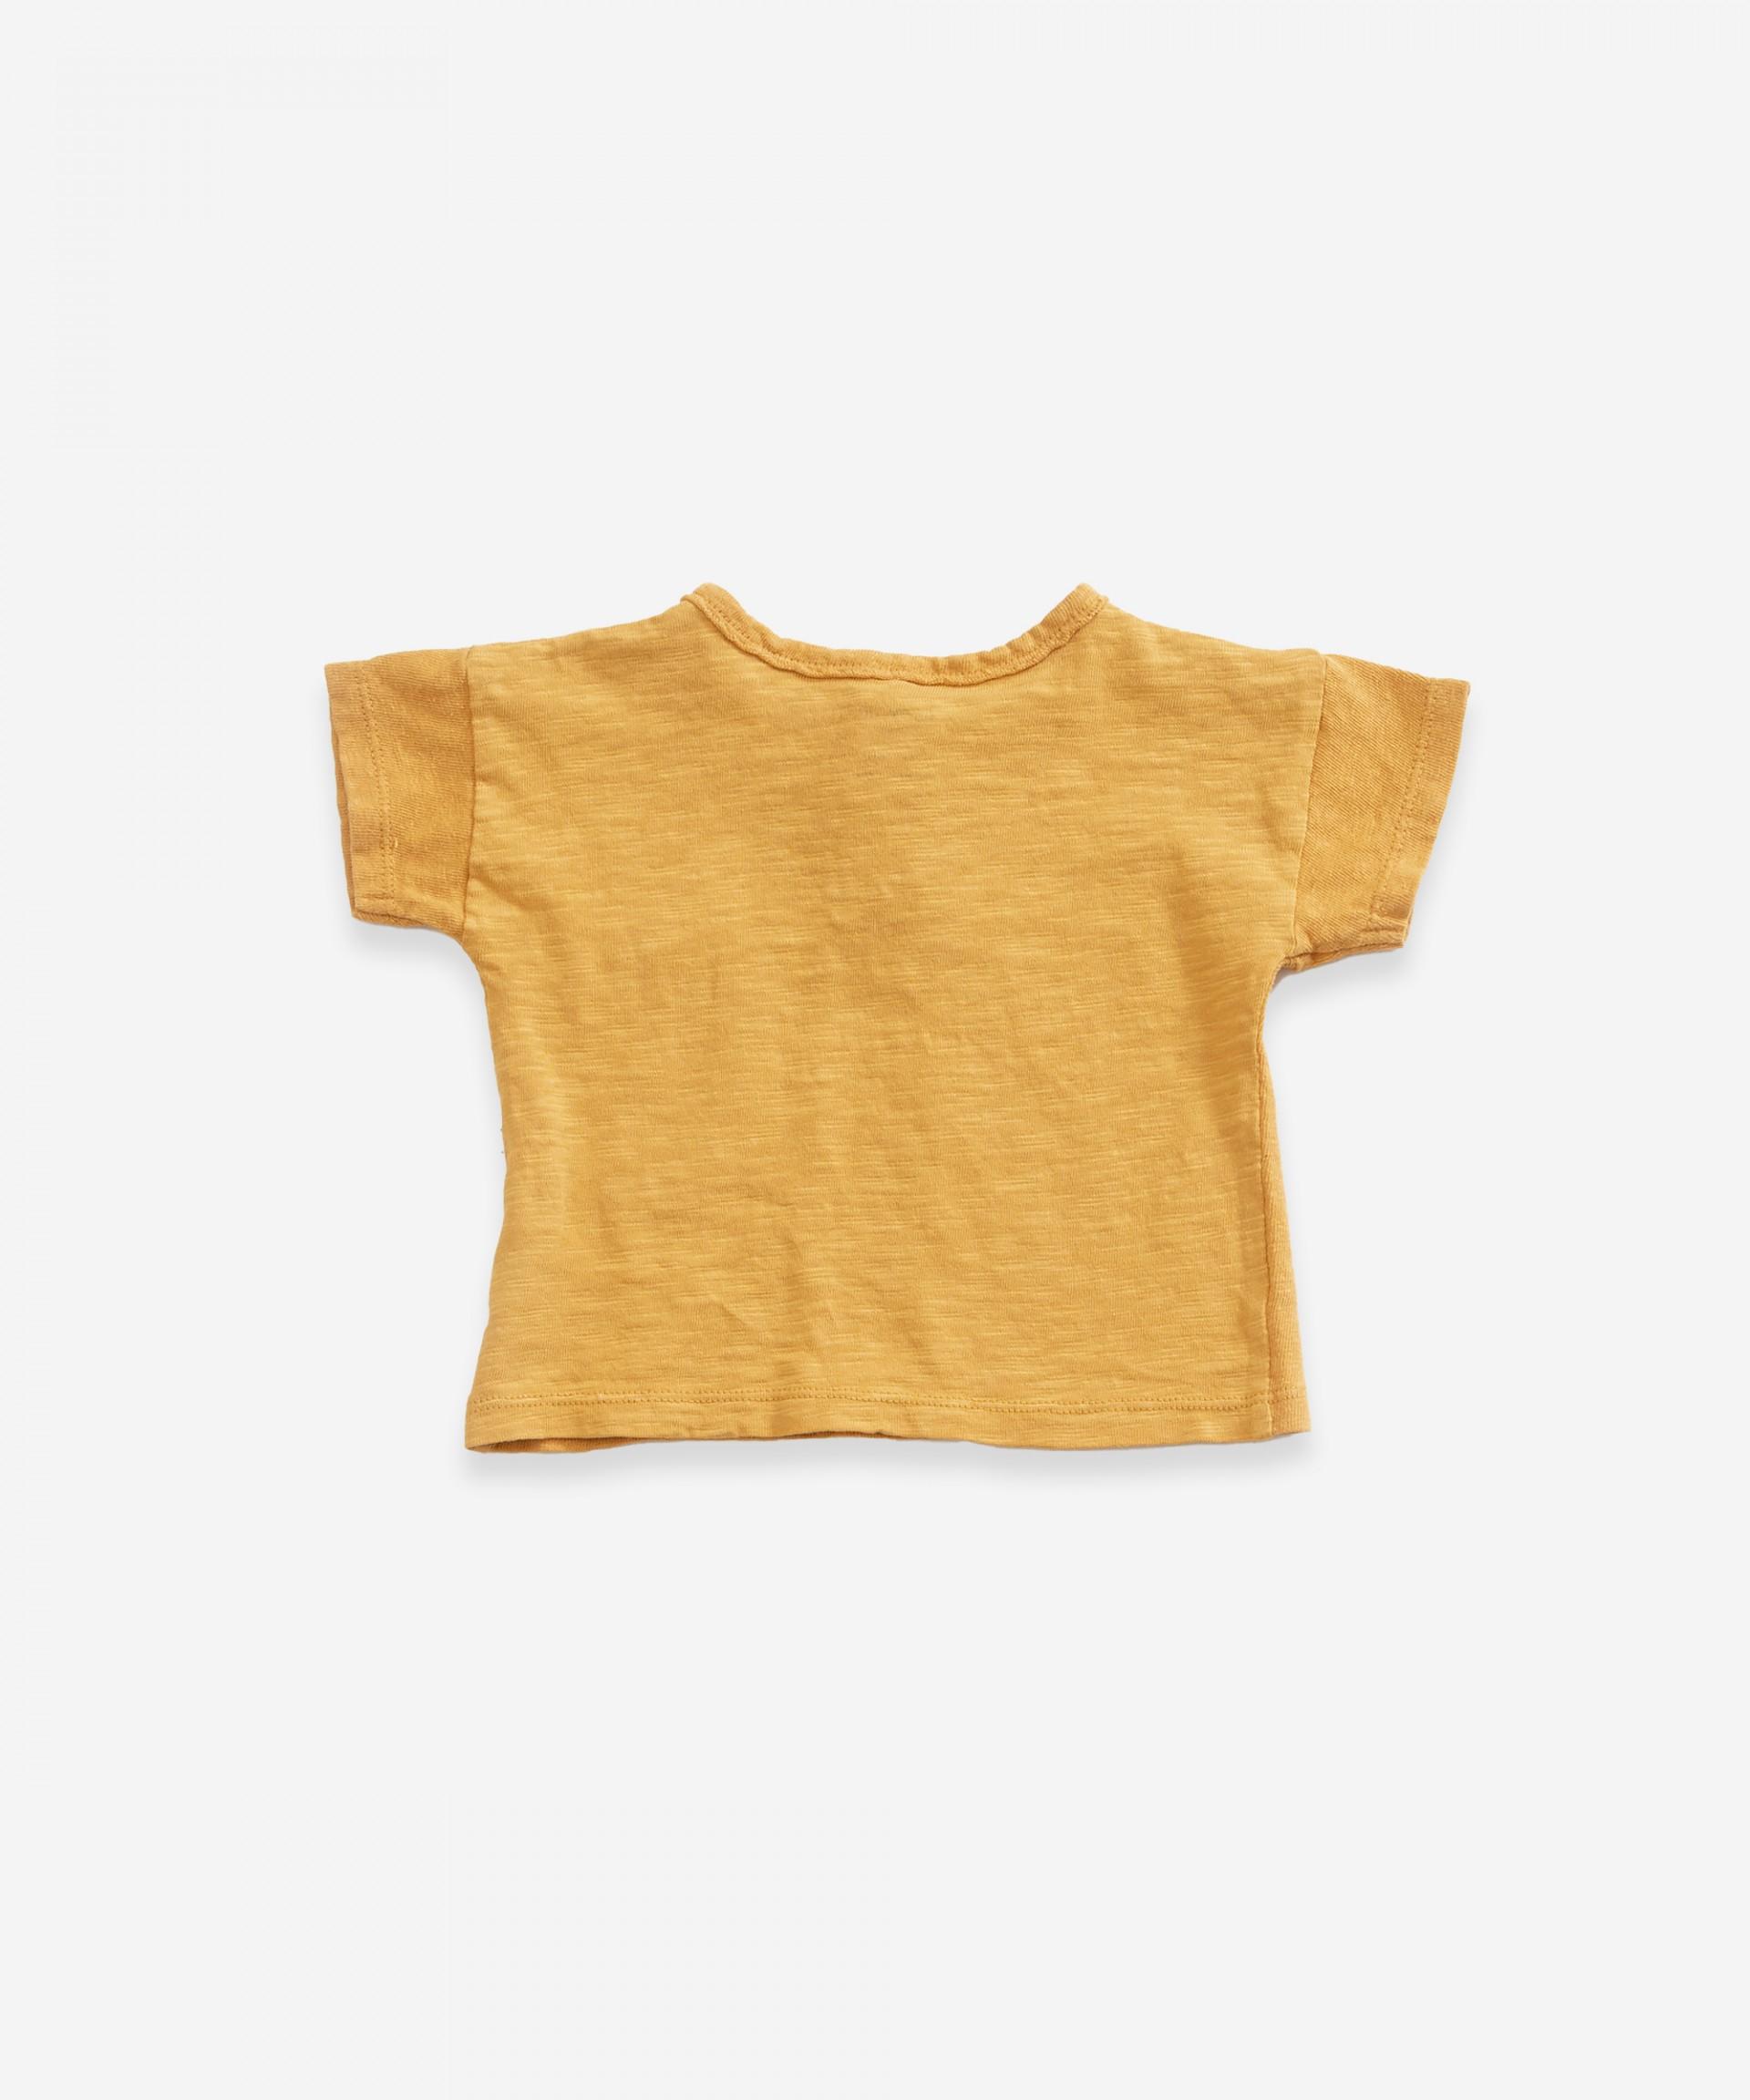 Camiseta de algodón orgánico con dos botones  | Weaving